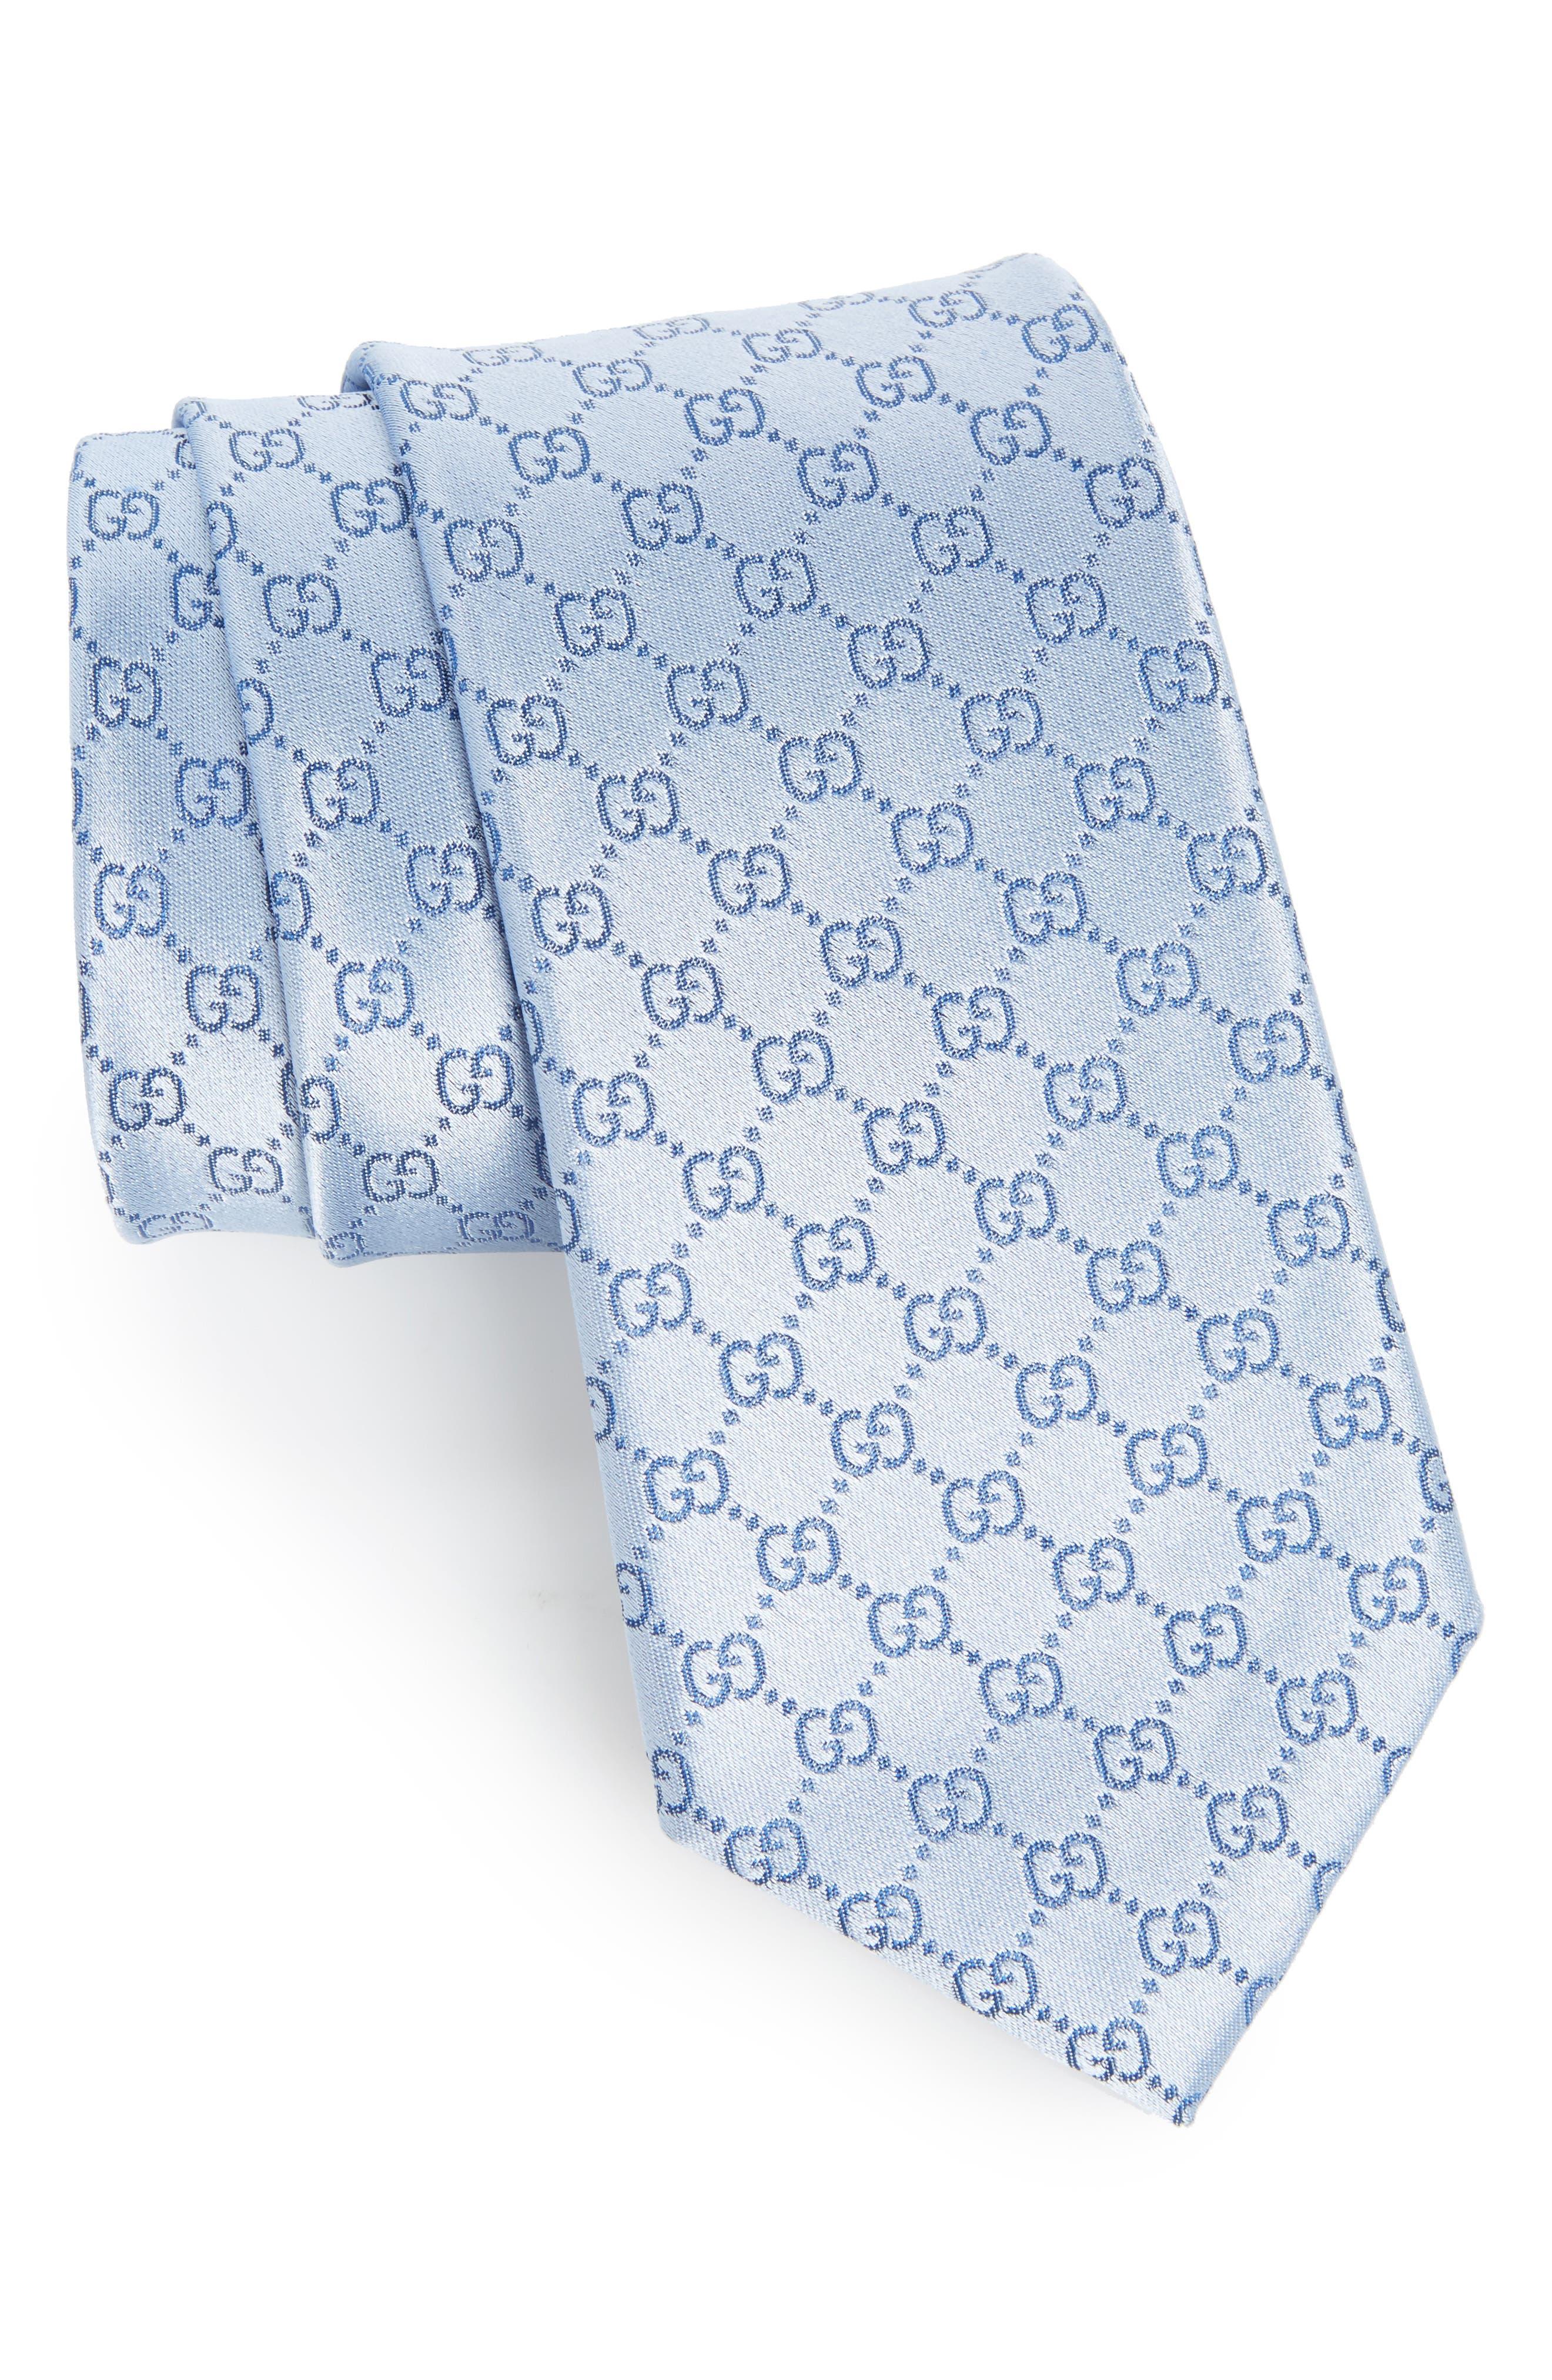 Gucci Federa Silk Jacquard Tie